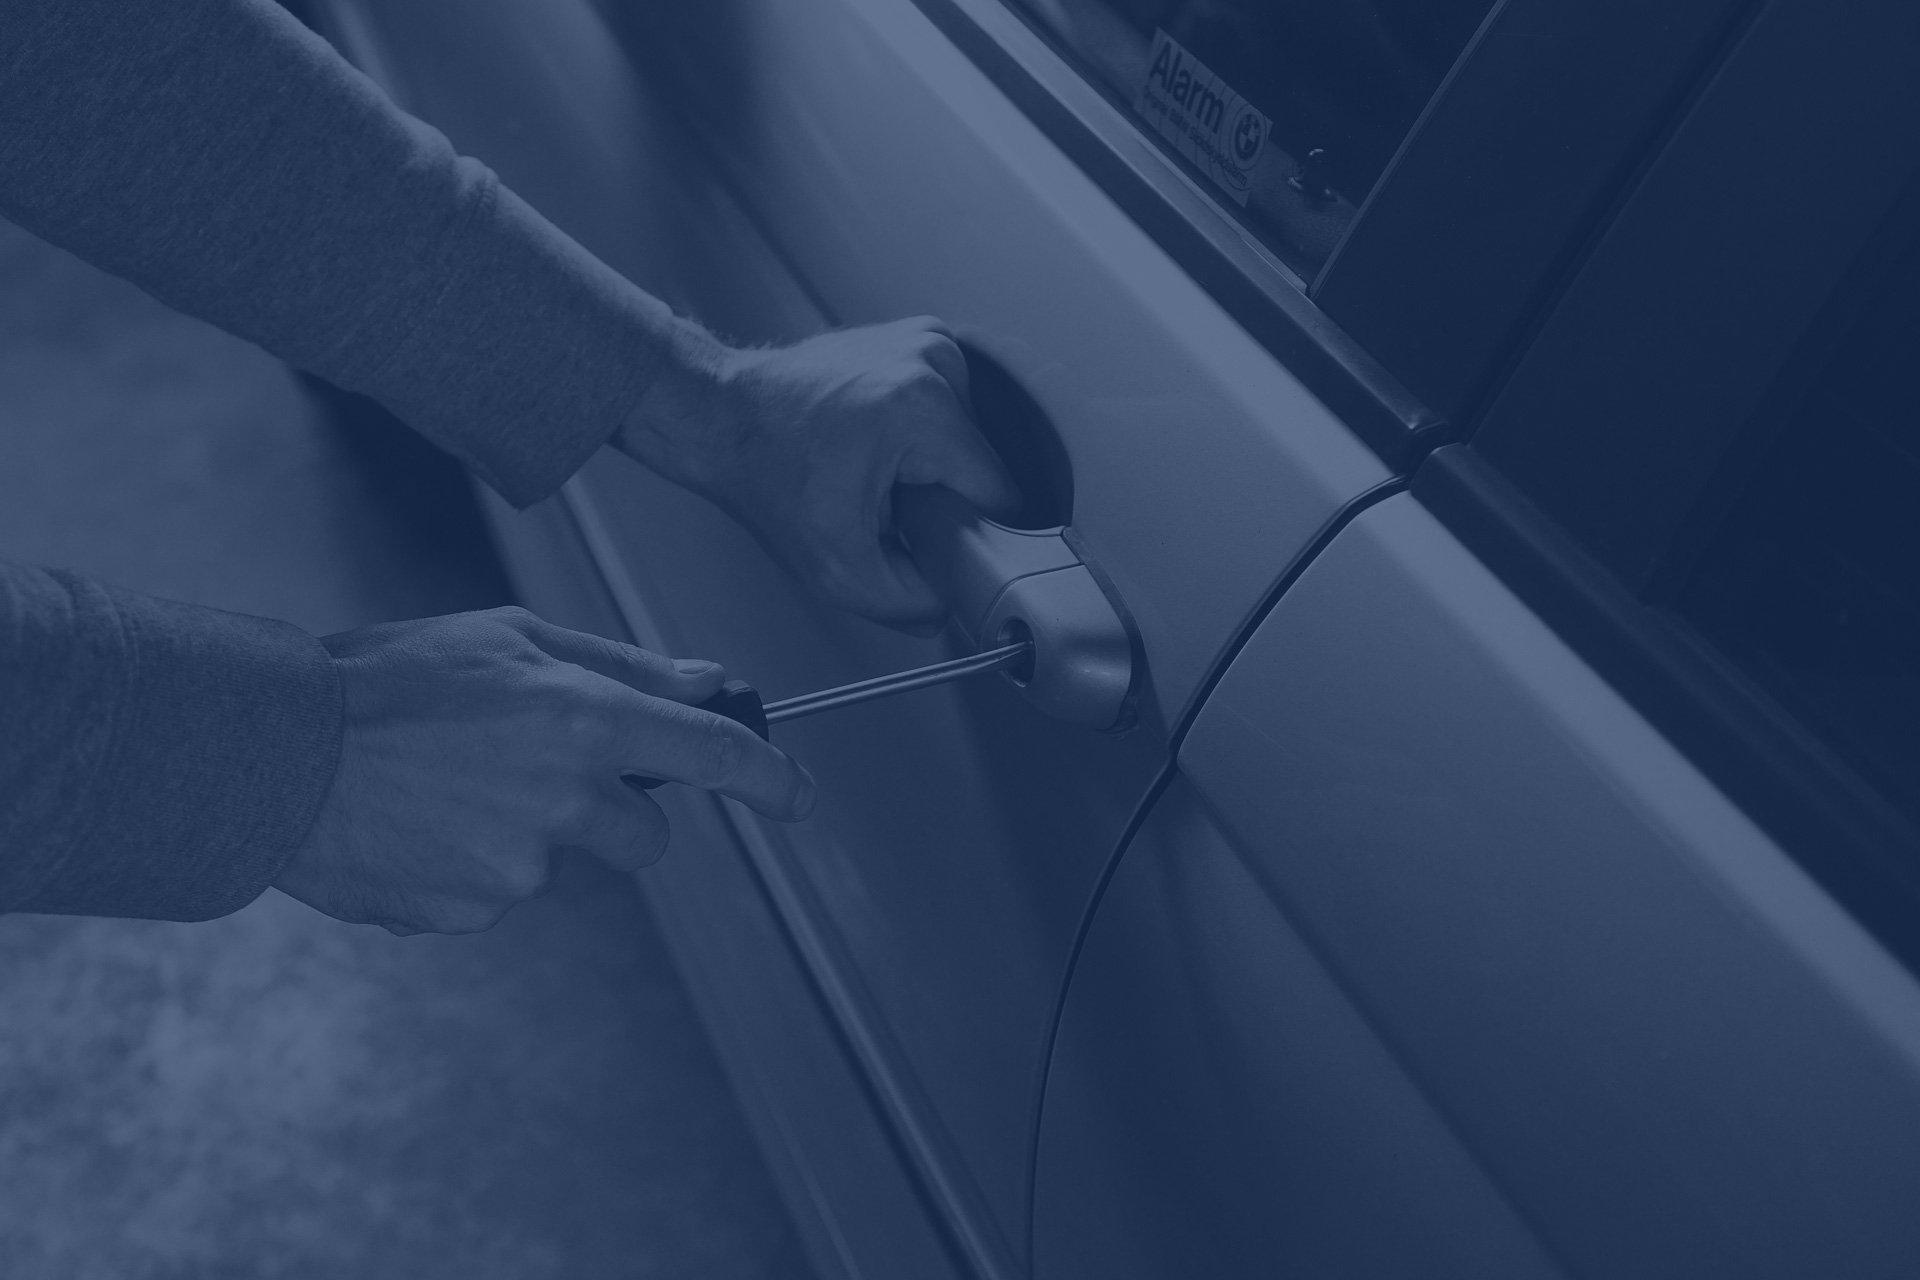 blue-car-theft